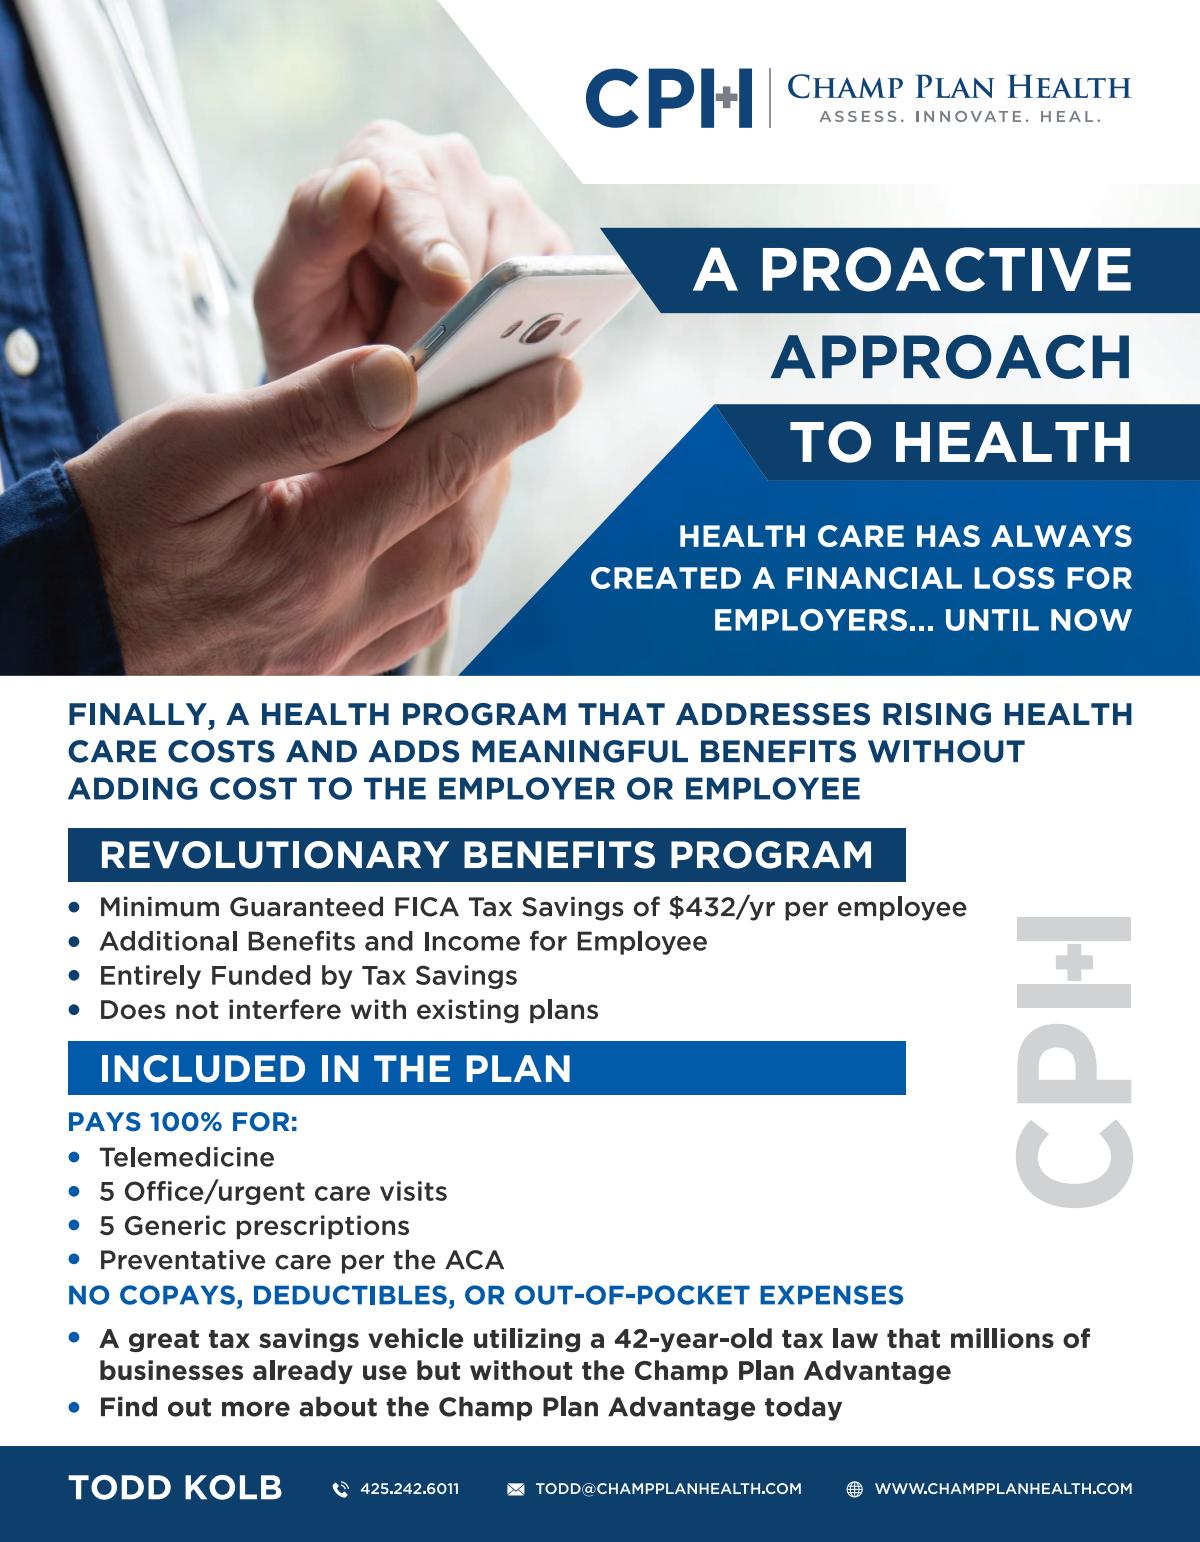 Champ Plan Health Brochure